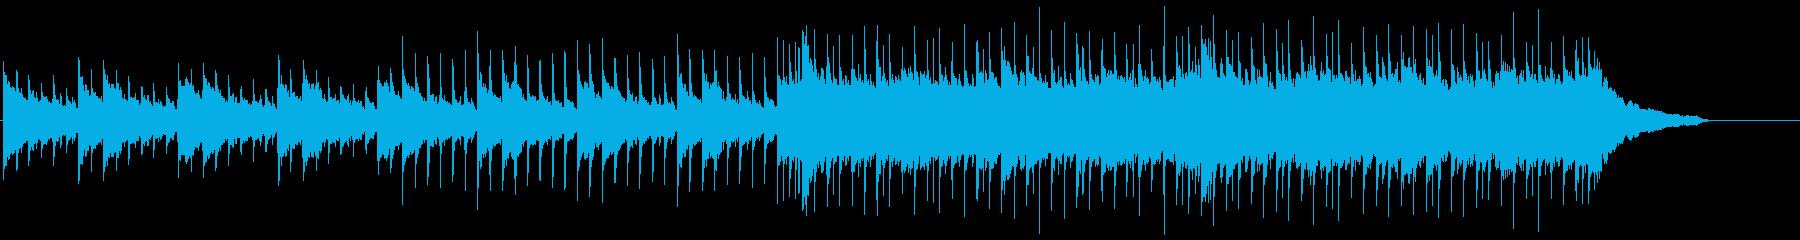 Corporate PopRock 131の再生済みの波形